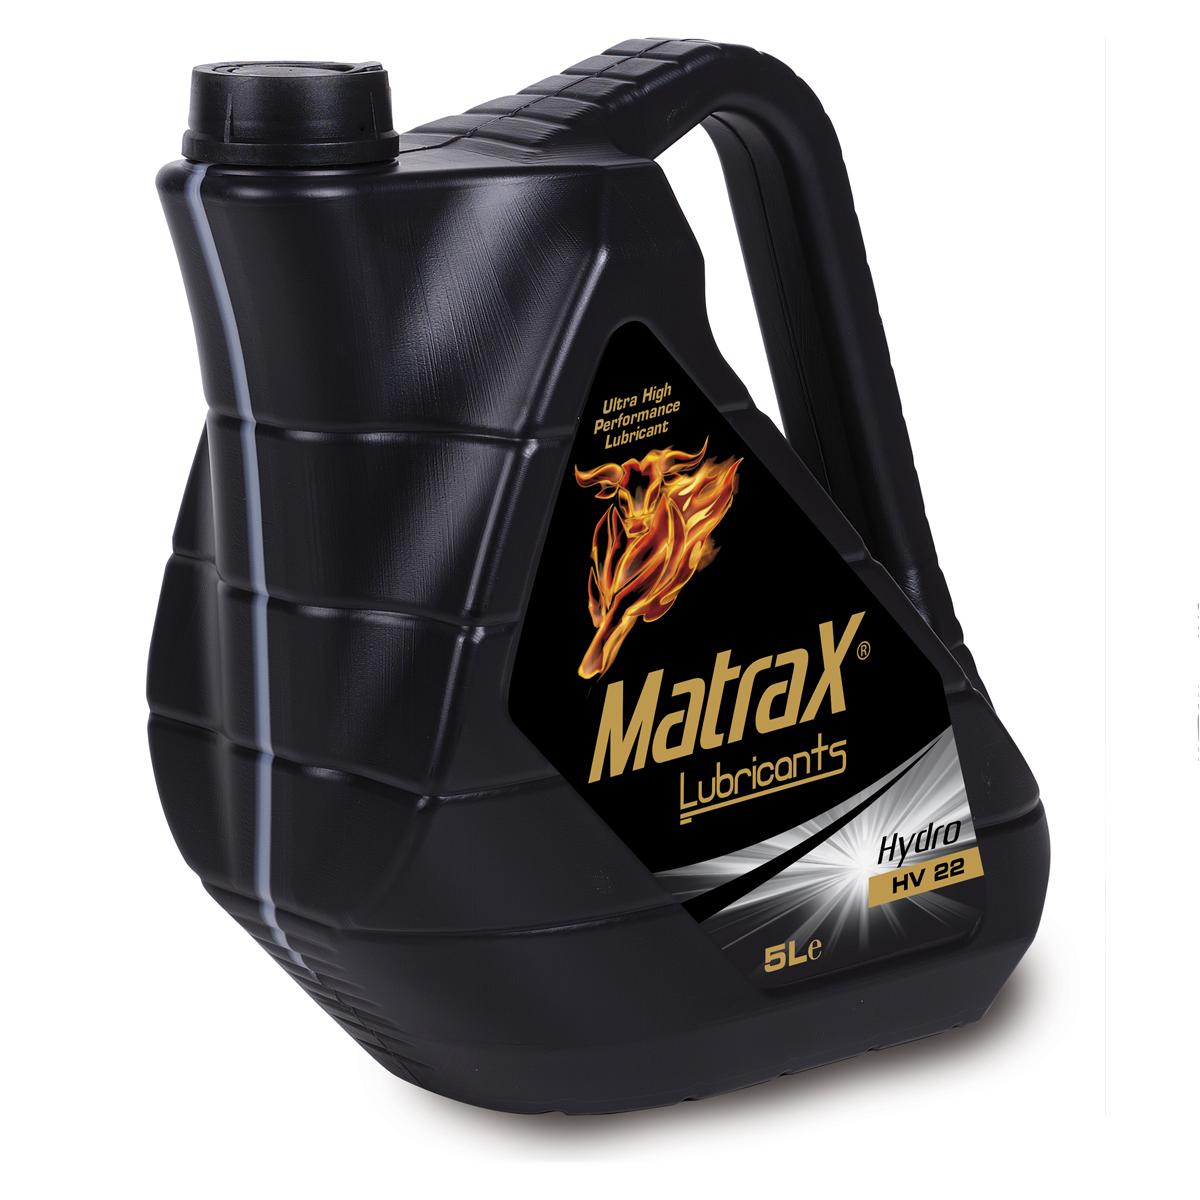 MatraX Hydro HV 22